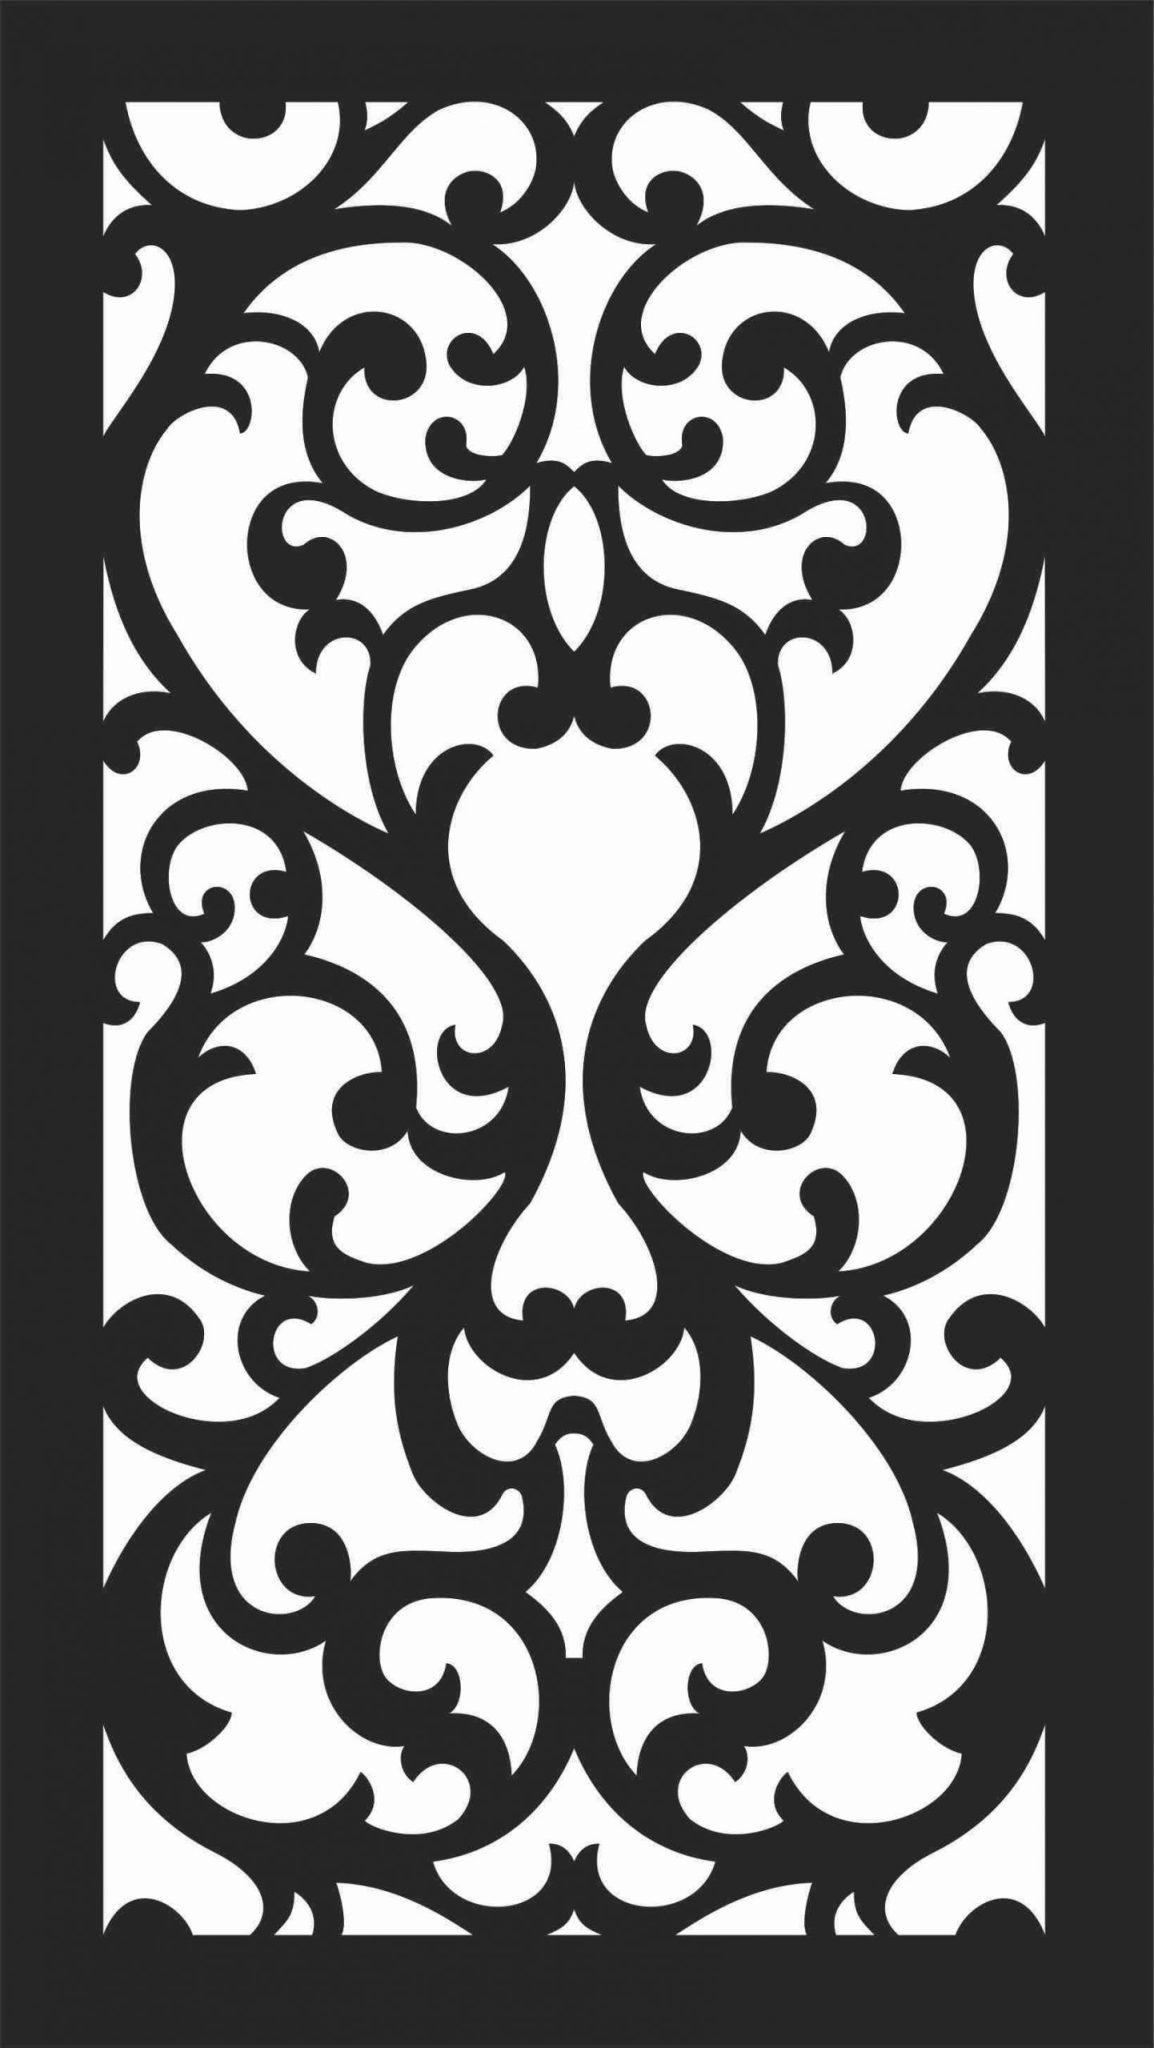 Screen Panel Patterns Seamless 89 Free DXF File